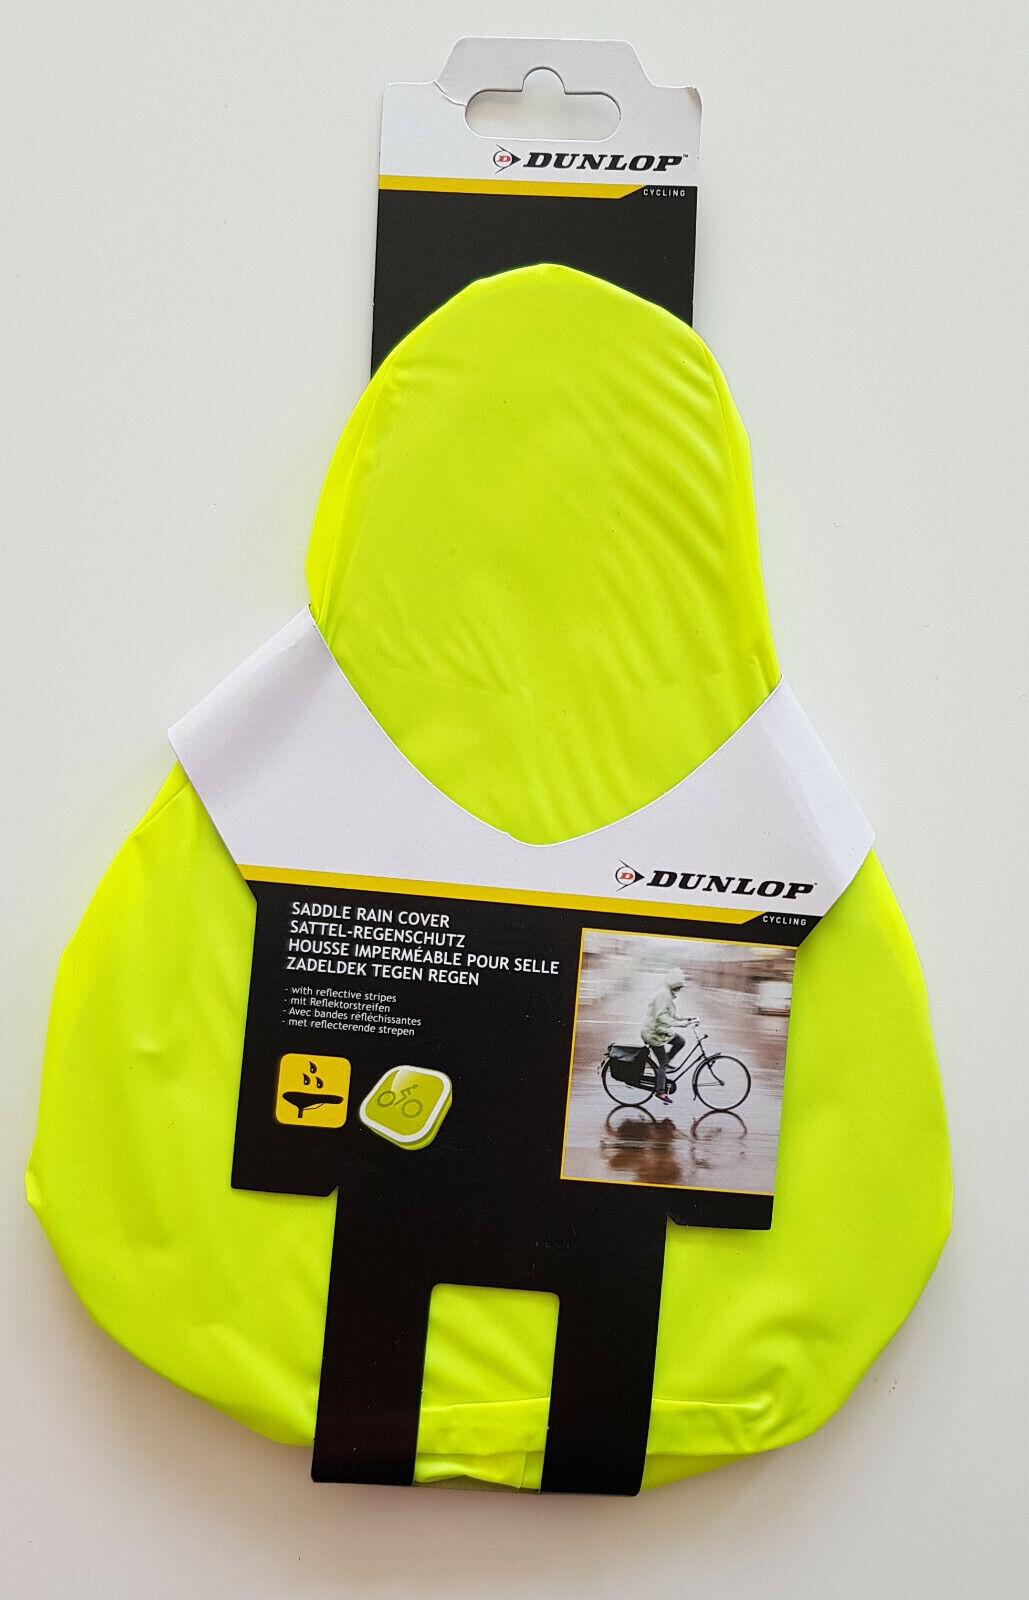 Dunlop Sattelüberzug Sattelschoner Regenschutz Fahrrad Fahrradsattel Sattelhülle